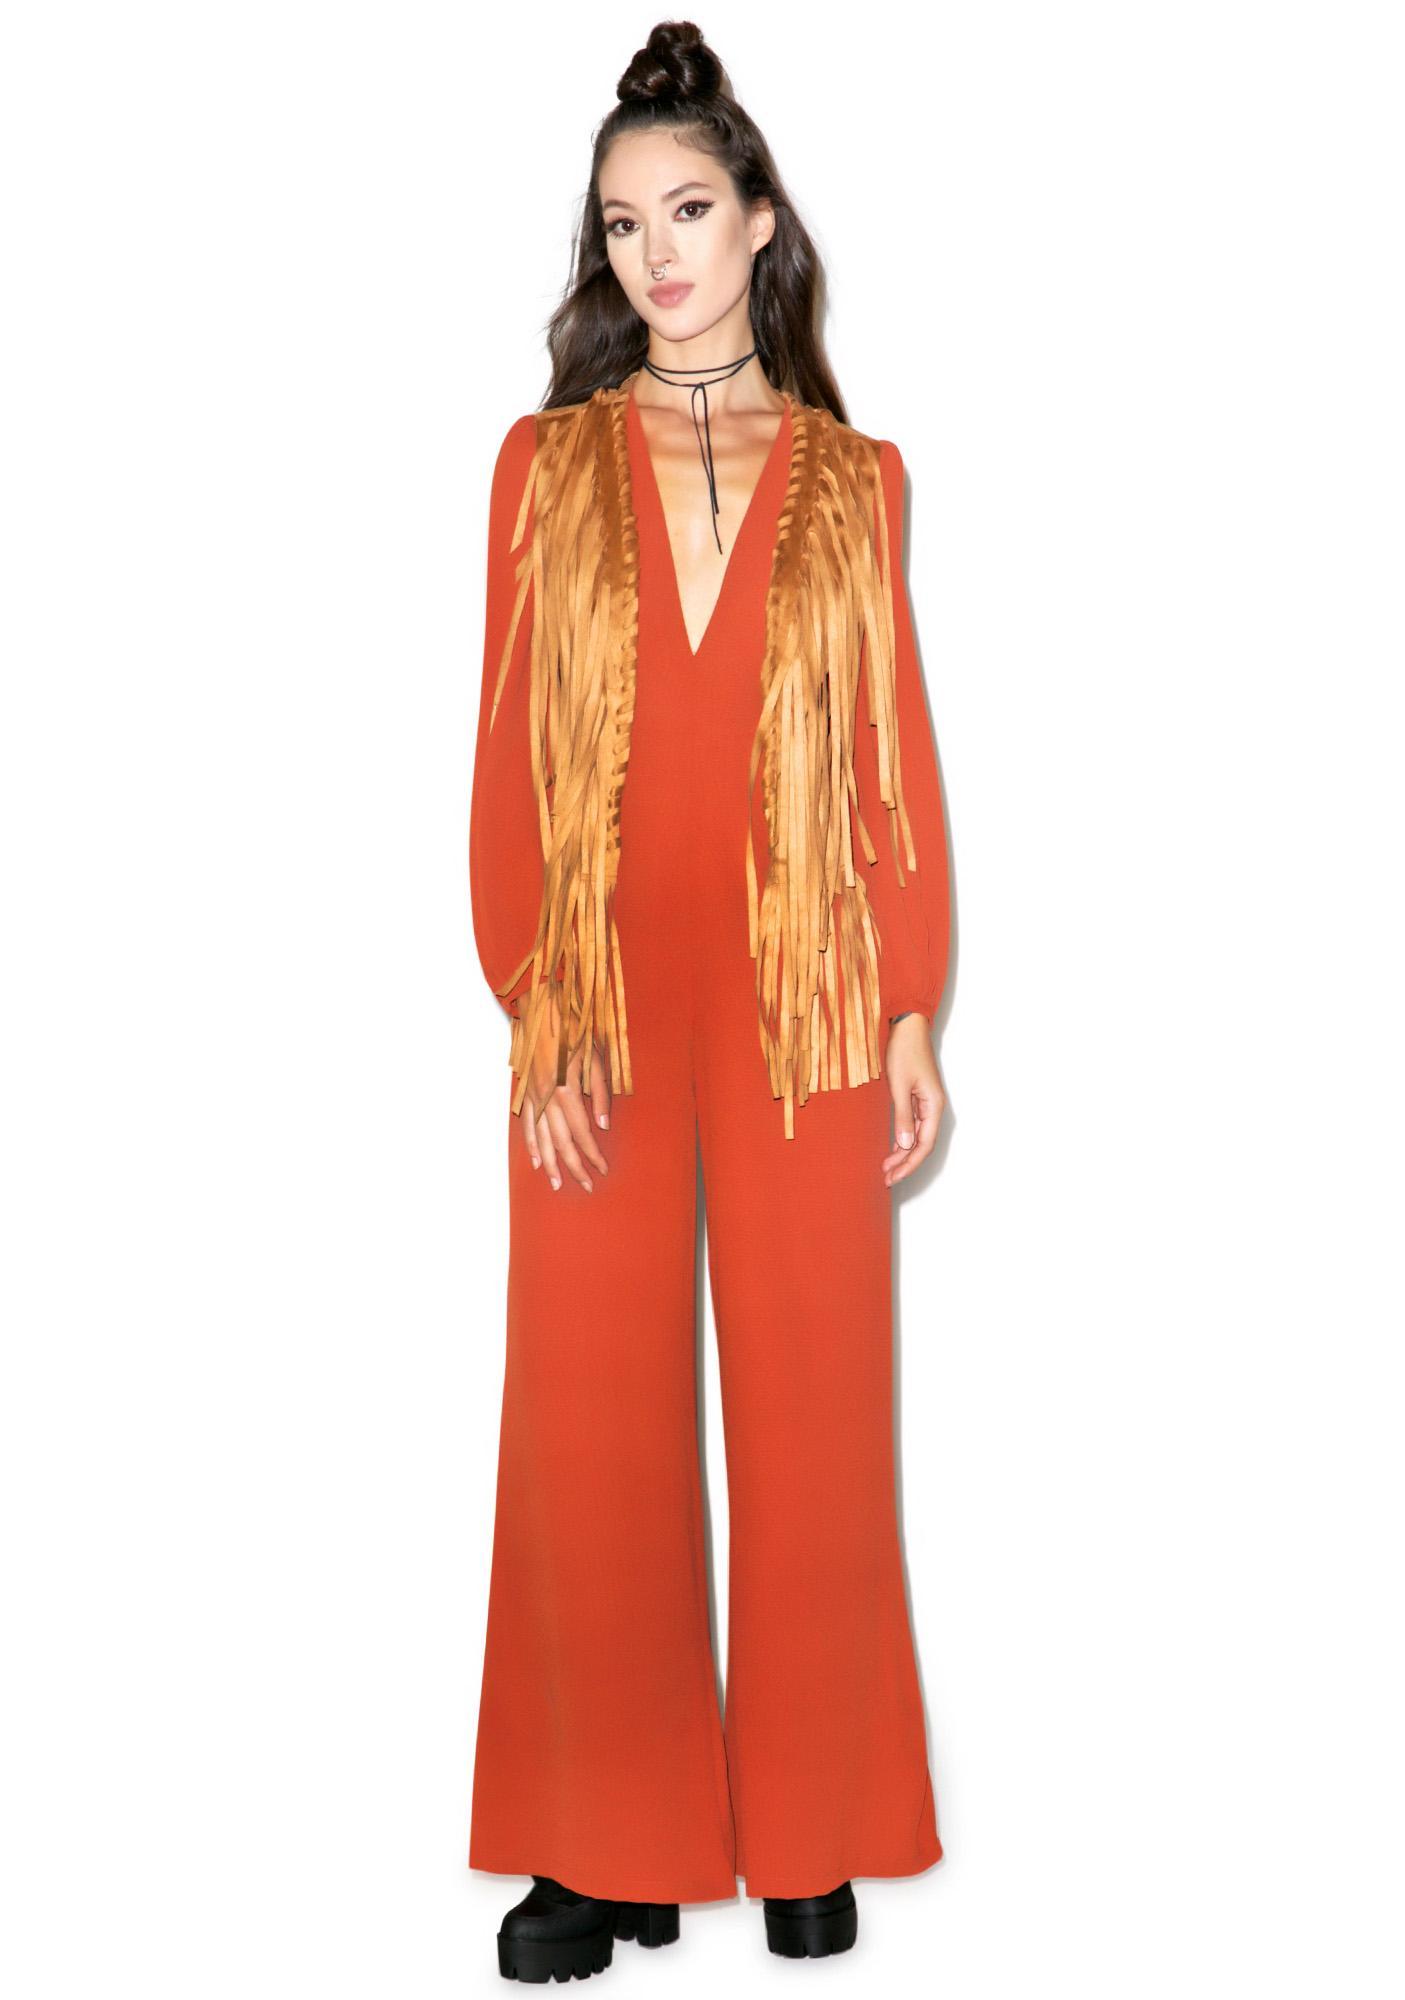 Glamorous Free Spirit Fringe Vest